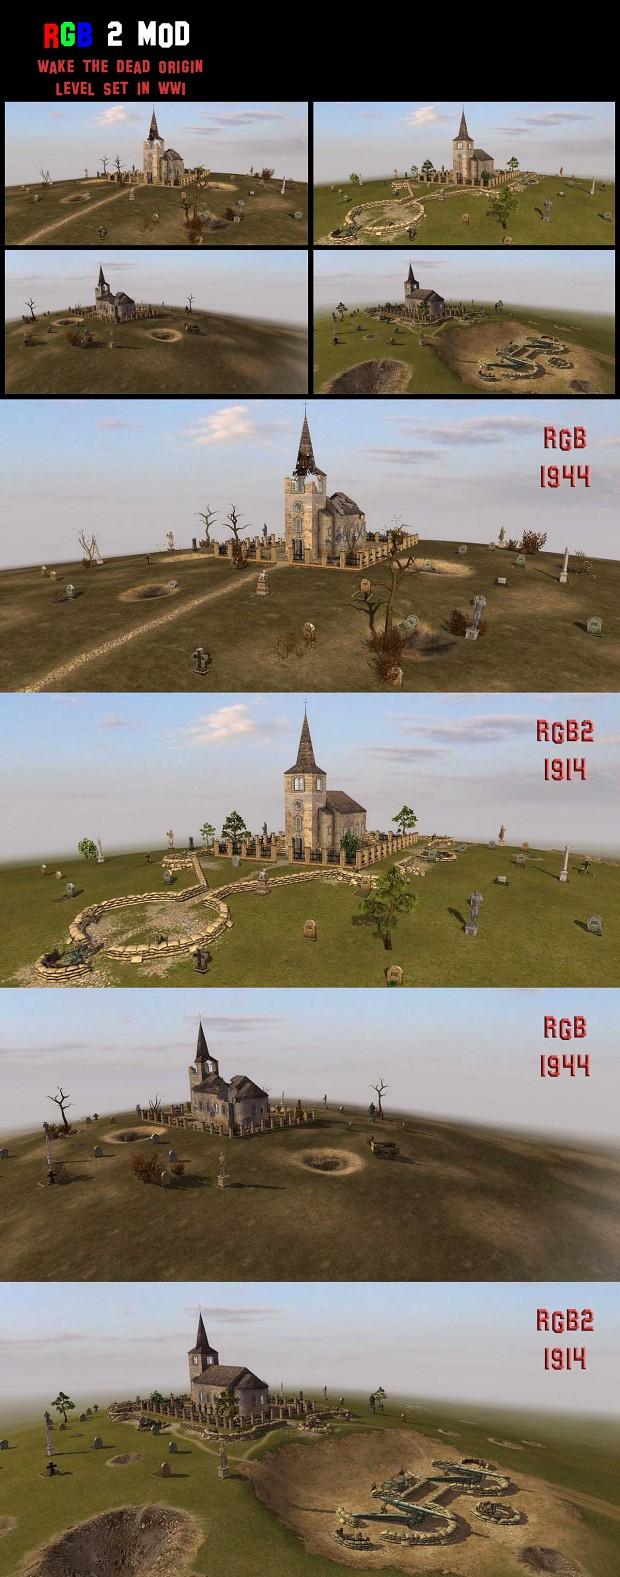 RGB2 Mod 'Wake the Dead' revealed